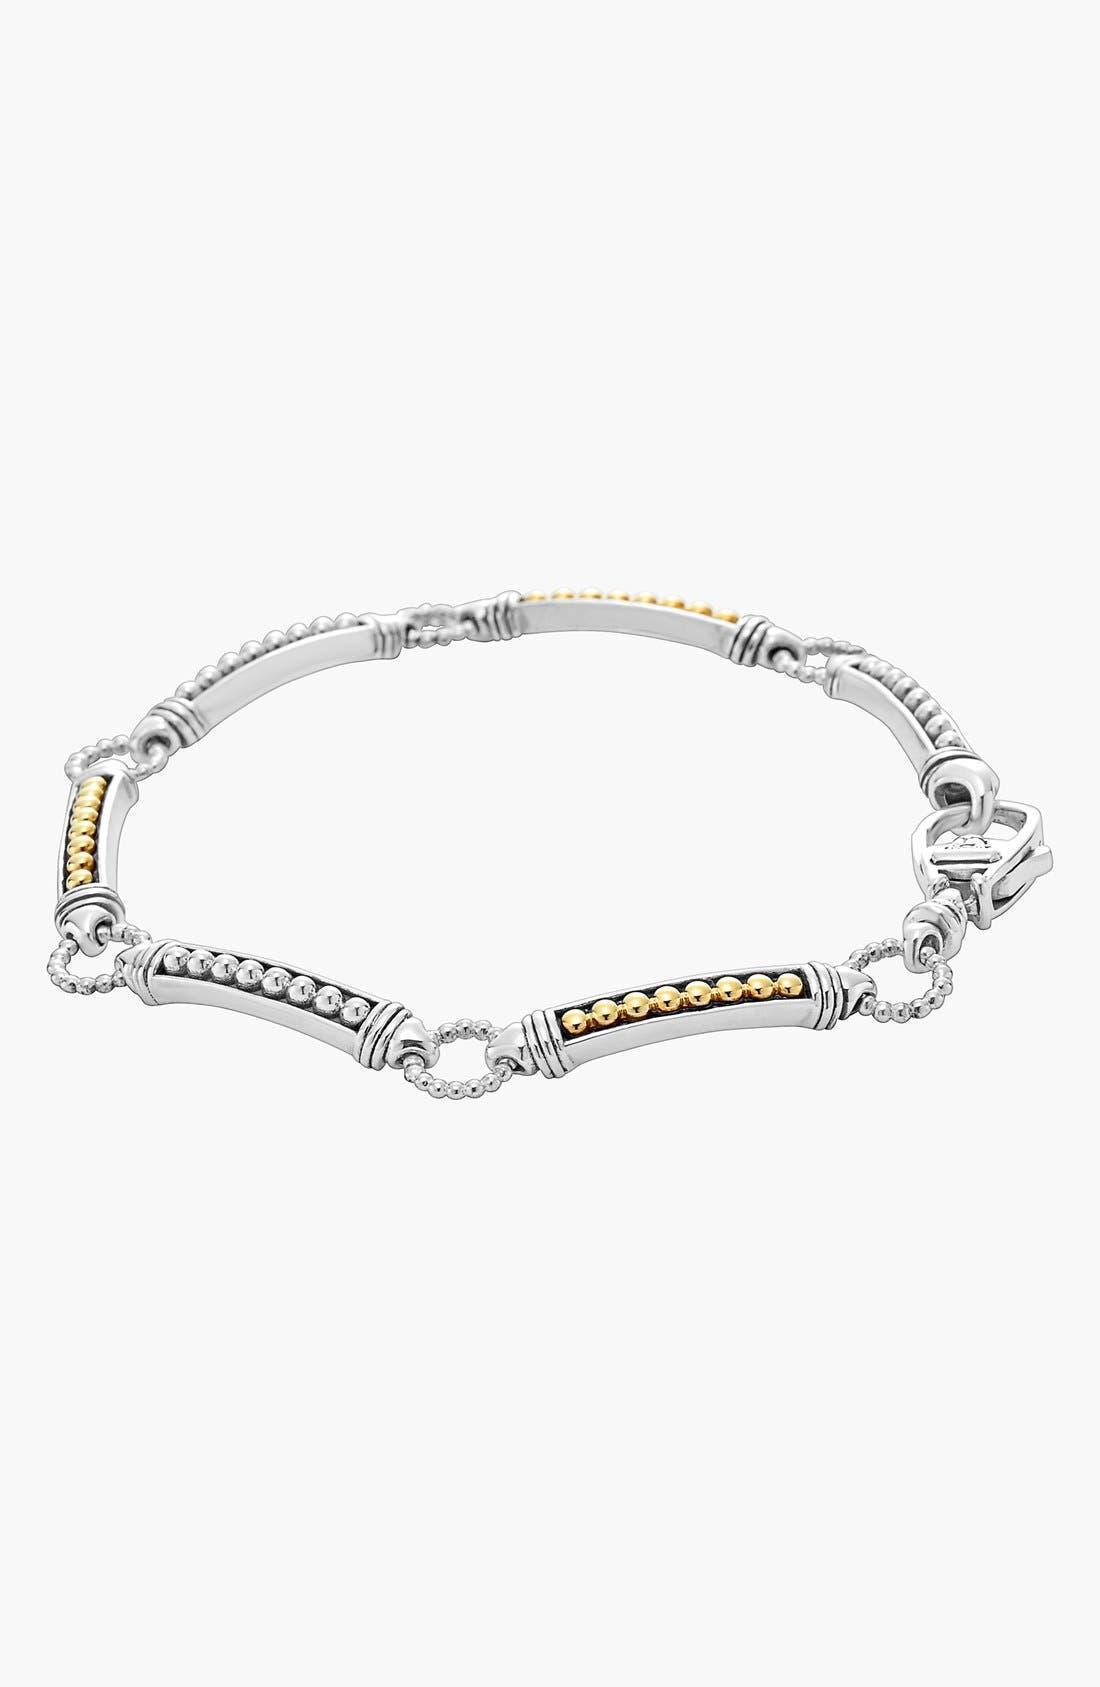 Caviar 'Superfine' Two-Tone Line Bracelet,                             Alternate thumbnail 4, color,                             040